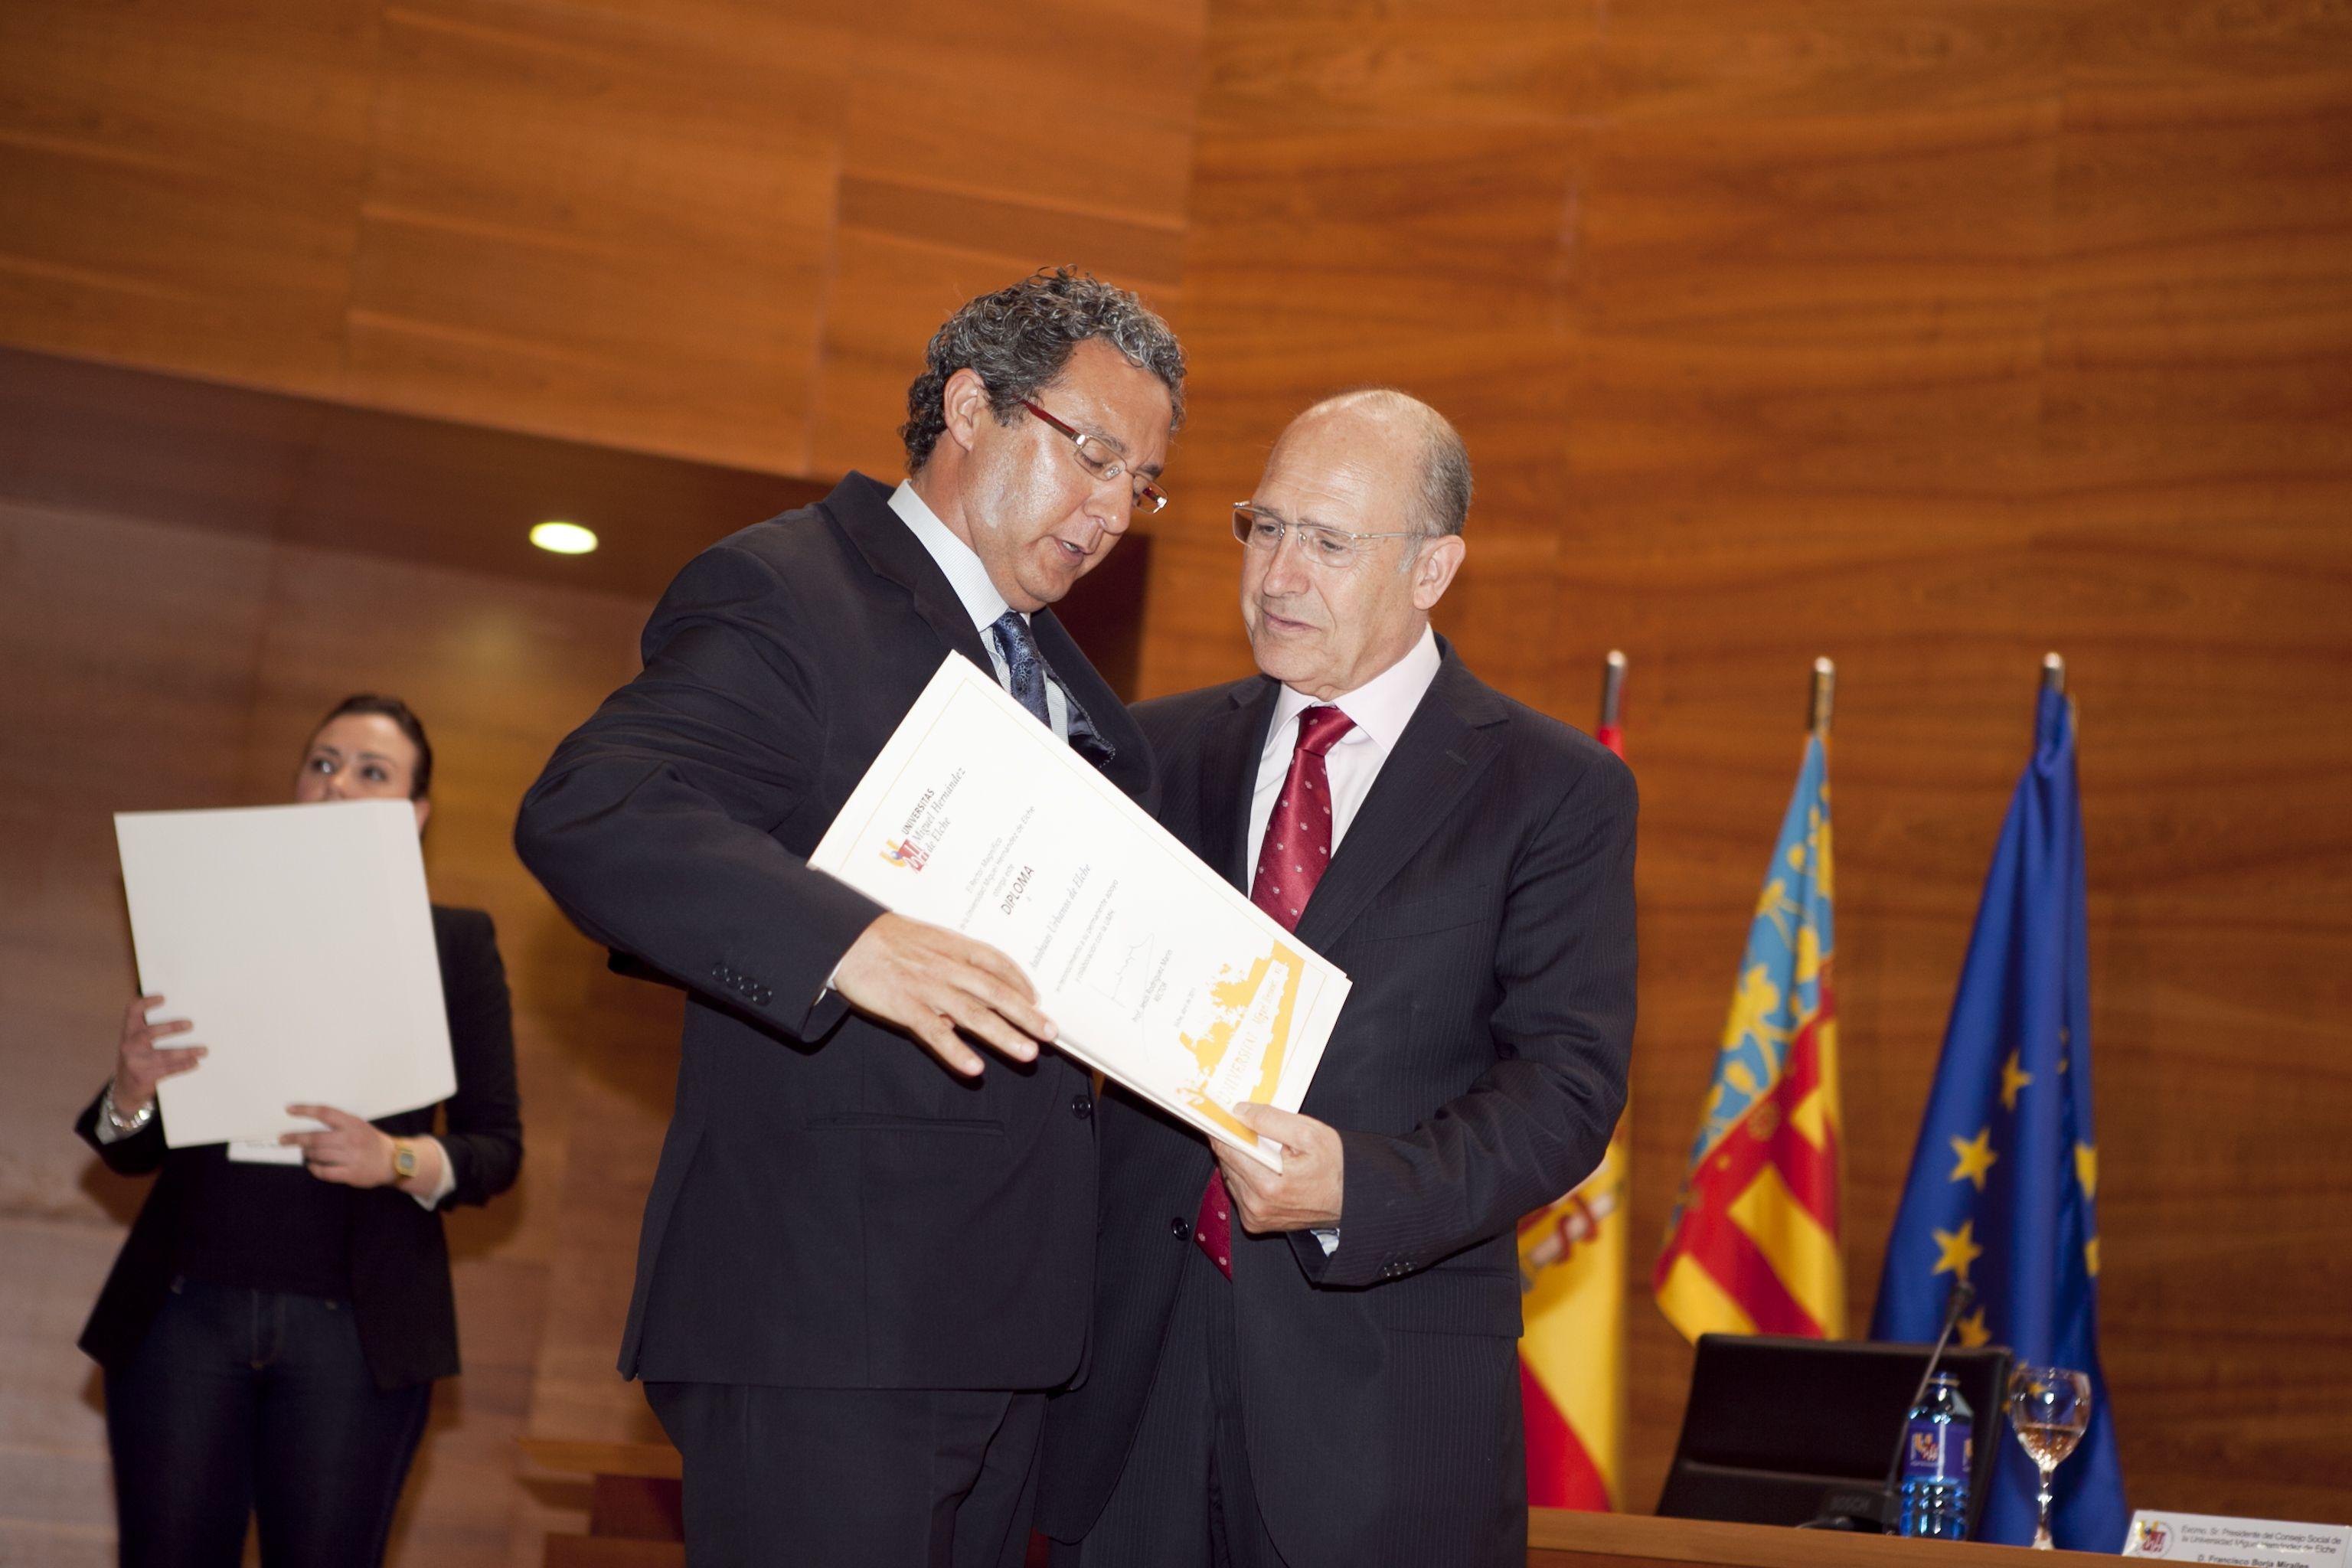 umh-diplomas-rector_mg_6821.jpg